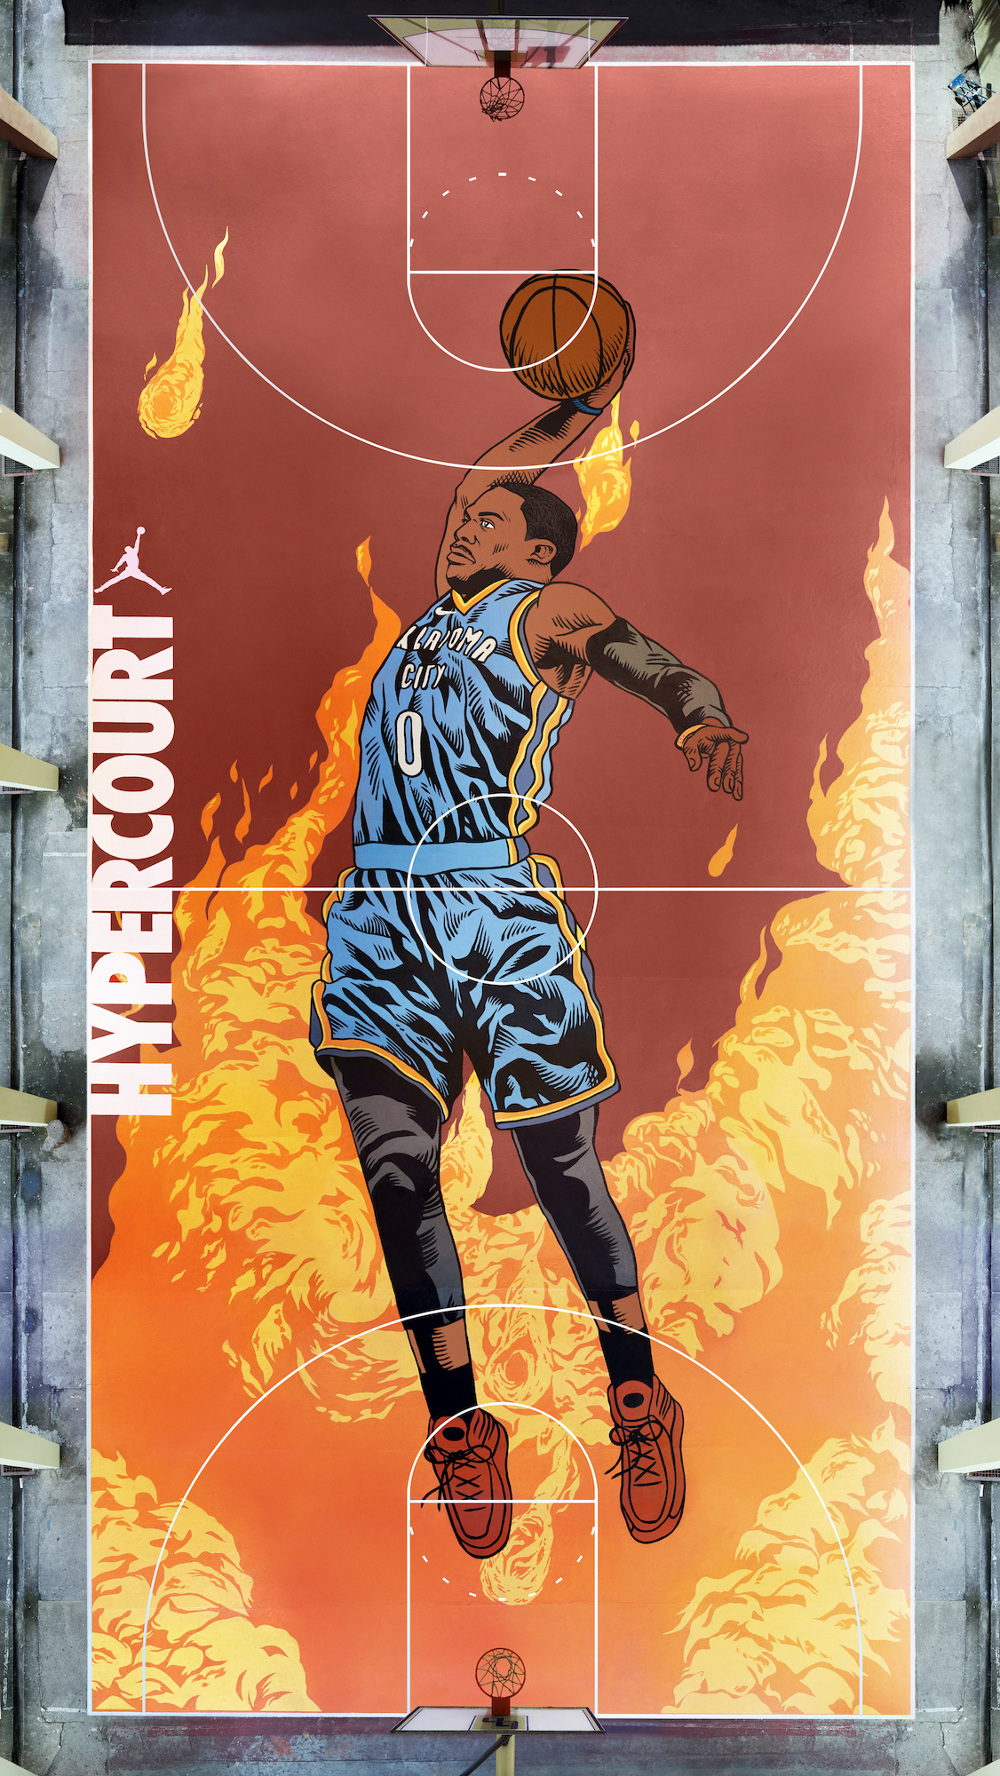 Nike-Basketball-Court2-101117Layers-copy-2_1000.jpg